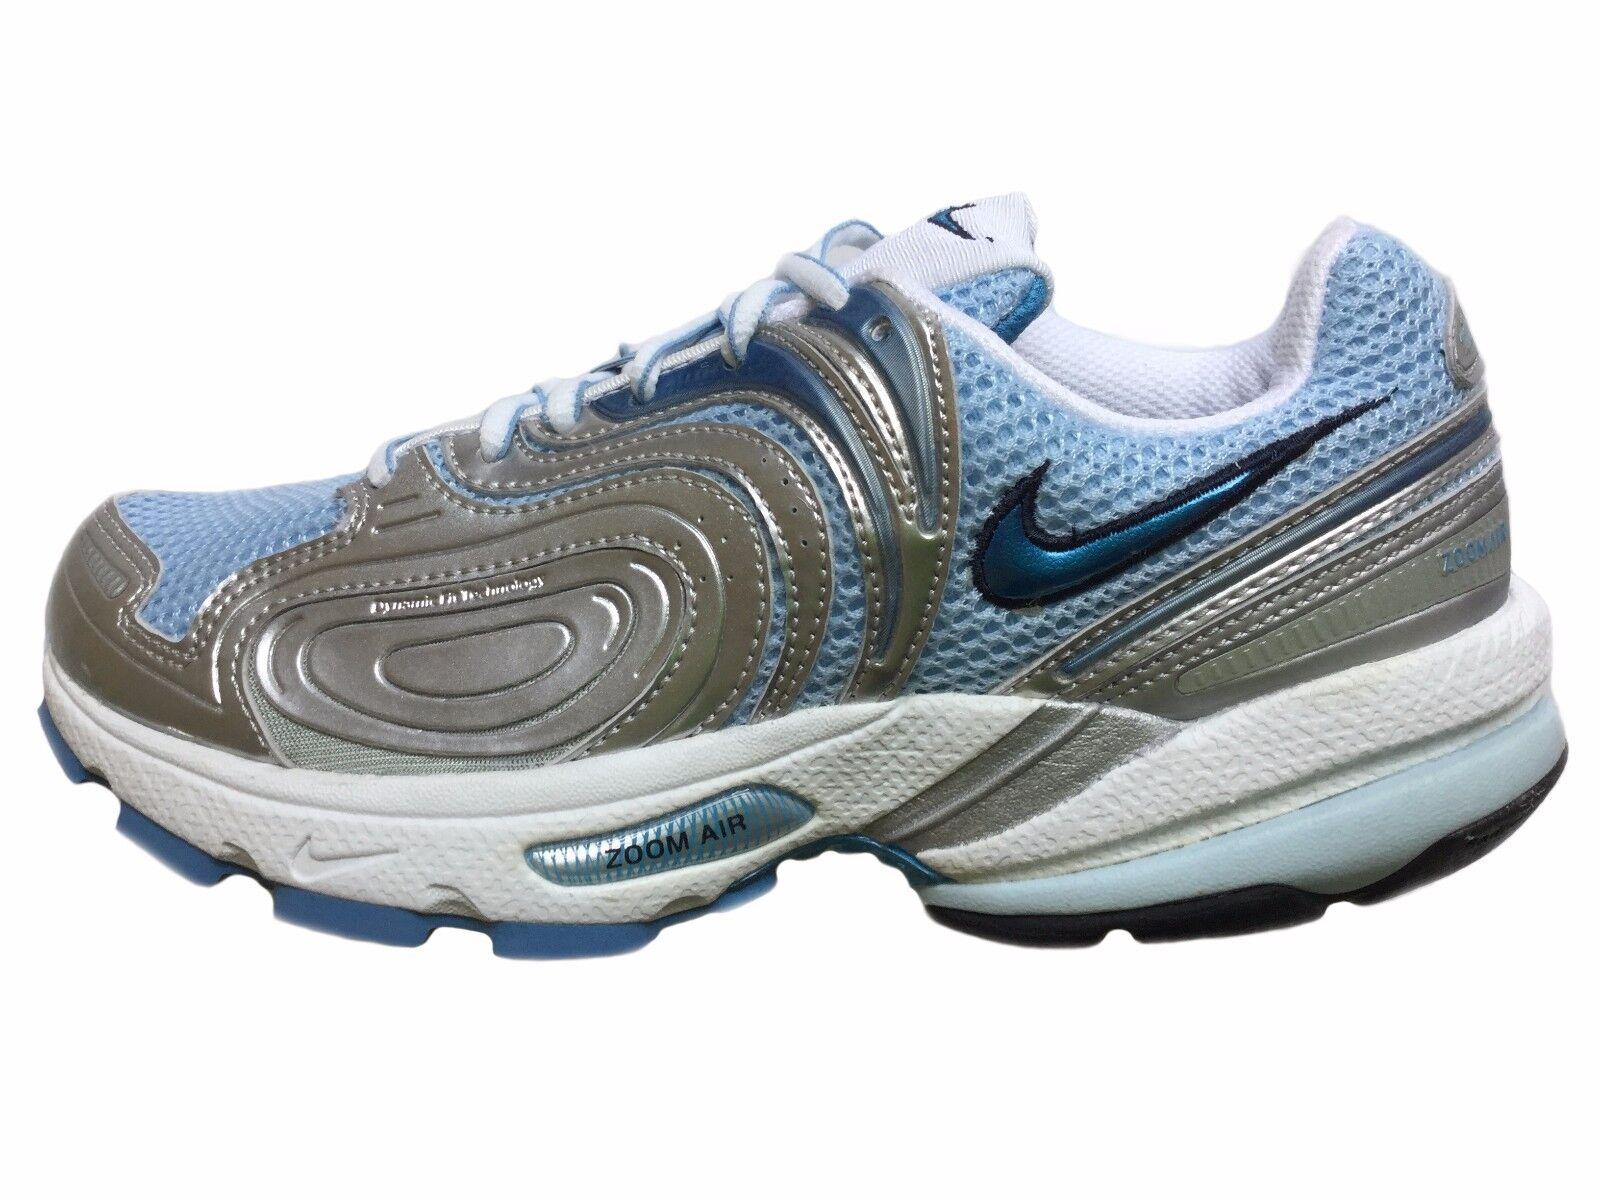 Nike air zoom percept donne allenatori - 312519 441 441 441 -     25 cm   Acquisti  e4f23d